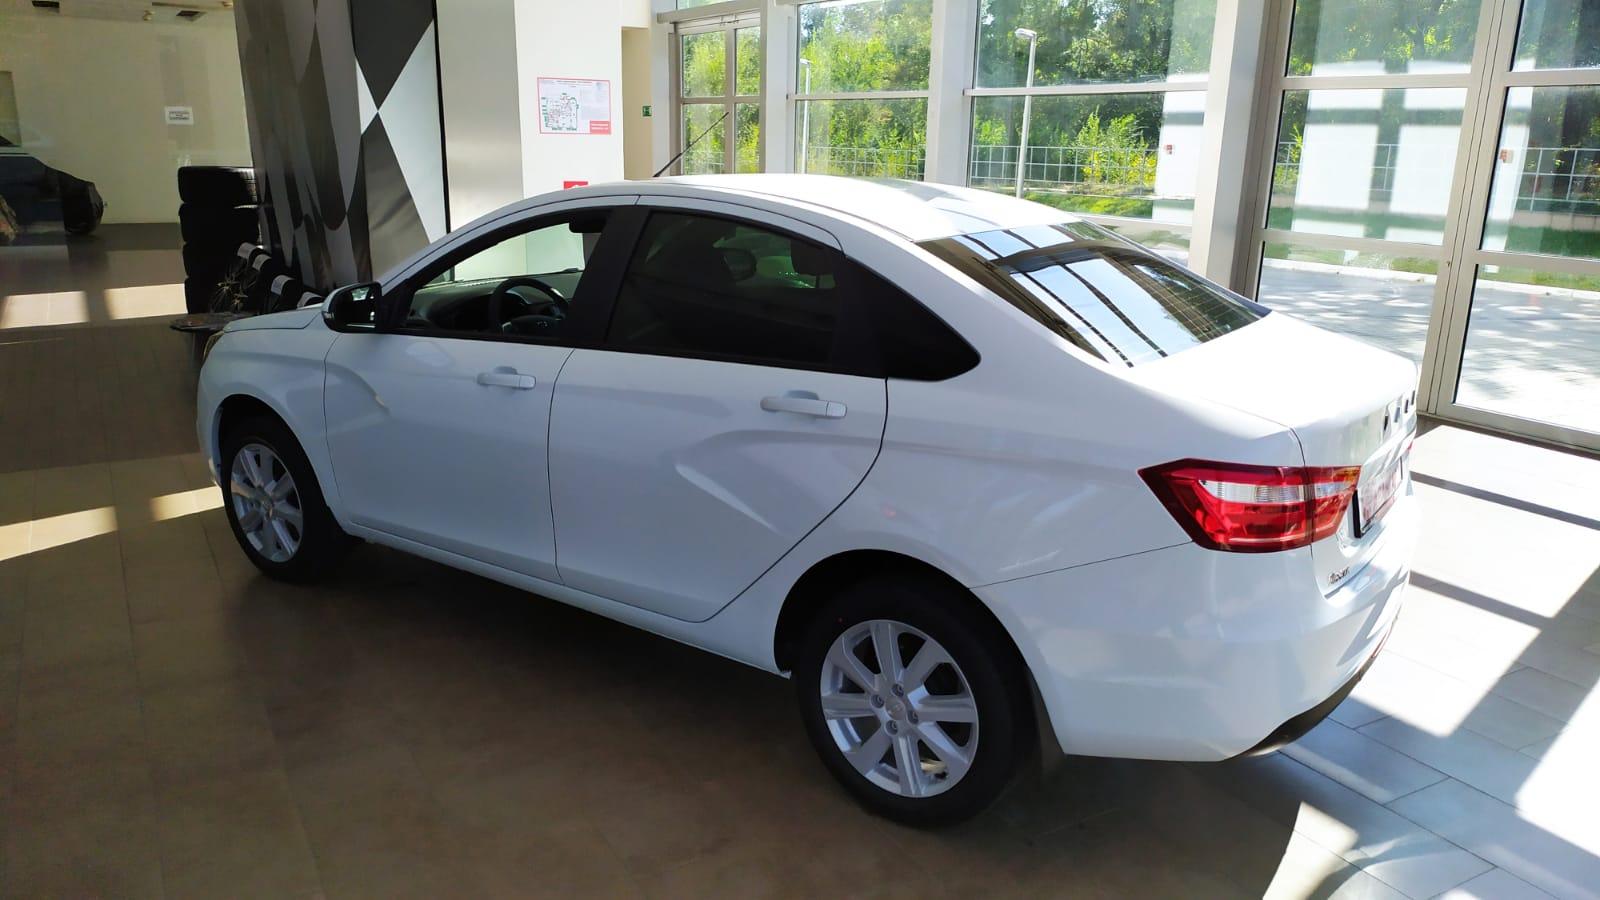 Lada Vesta седан 1.6 л 16-кл. (106 л.с.), 5МТ. Comfort-Winter EnjoY. Белый. 2021